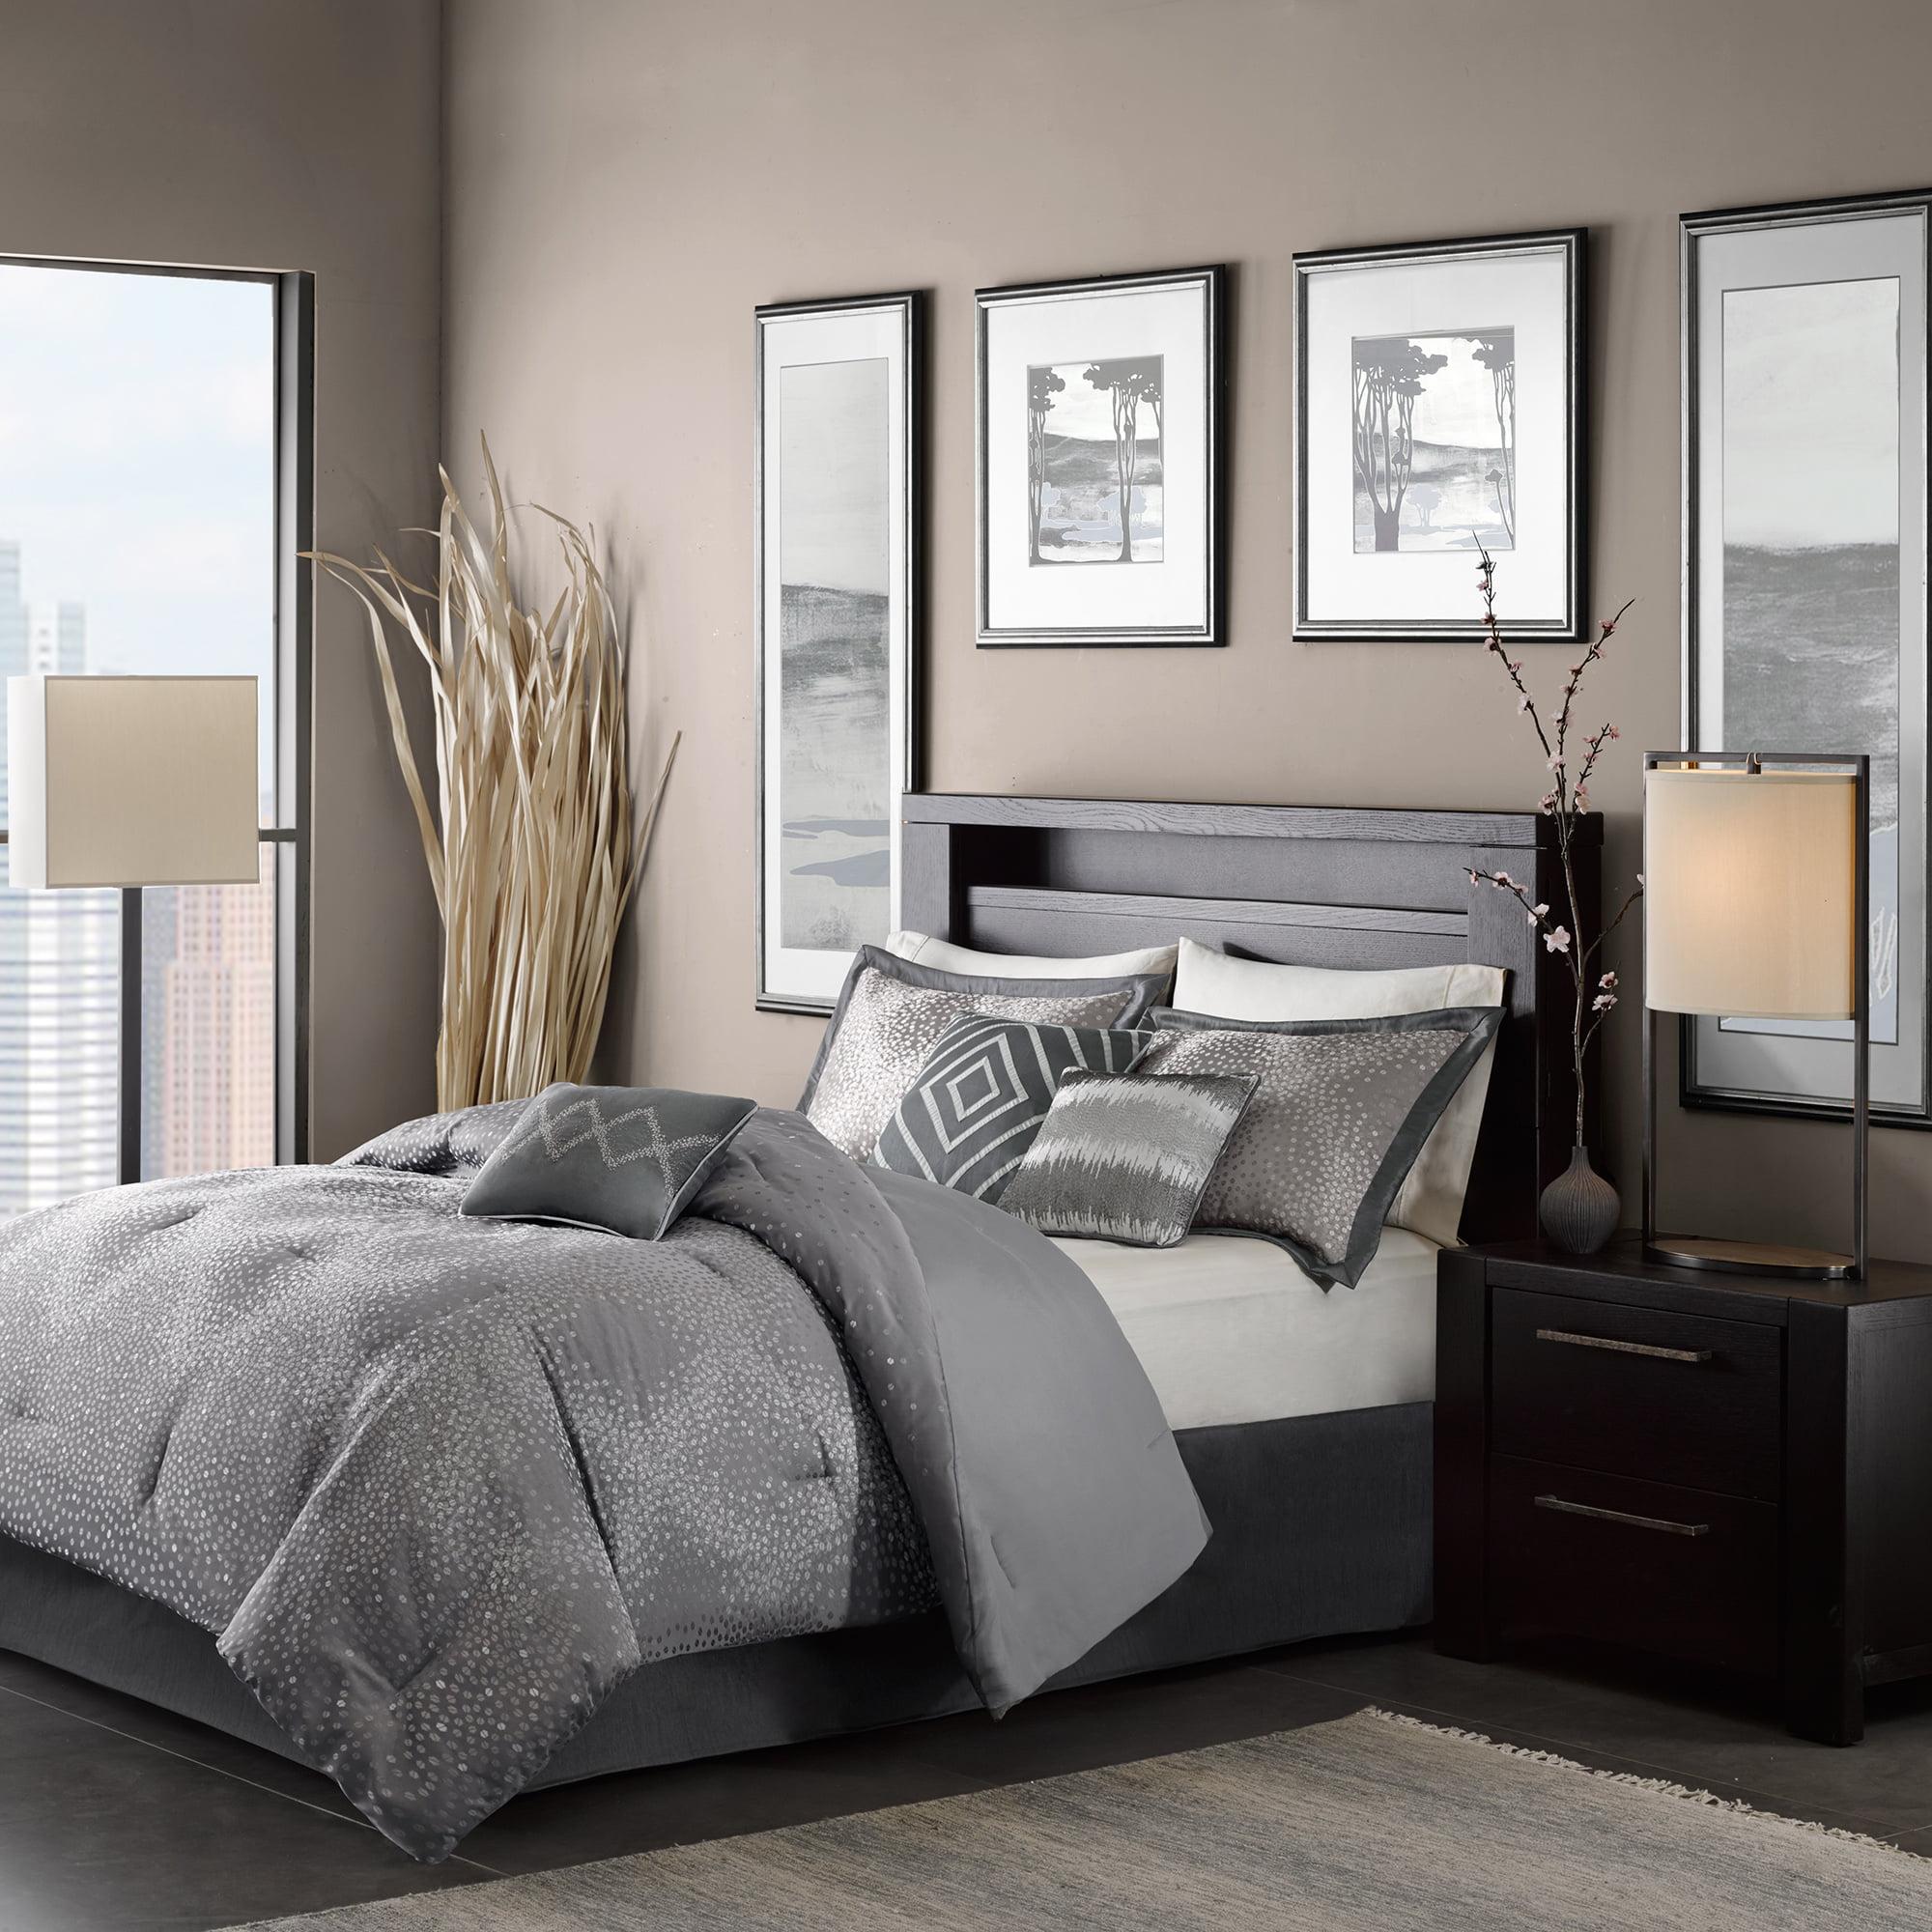 Home Essence Garner 7 Piece Jacquard Comforter Set